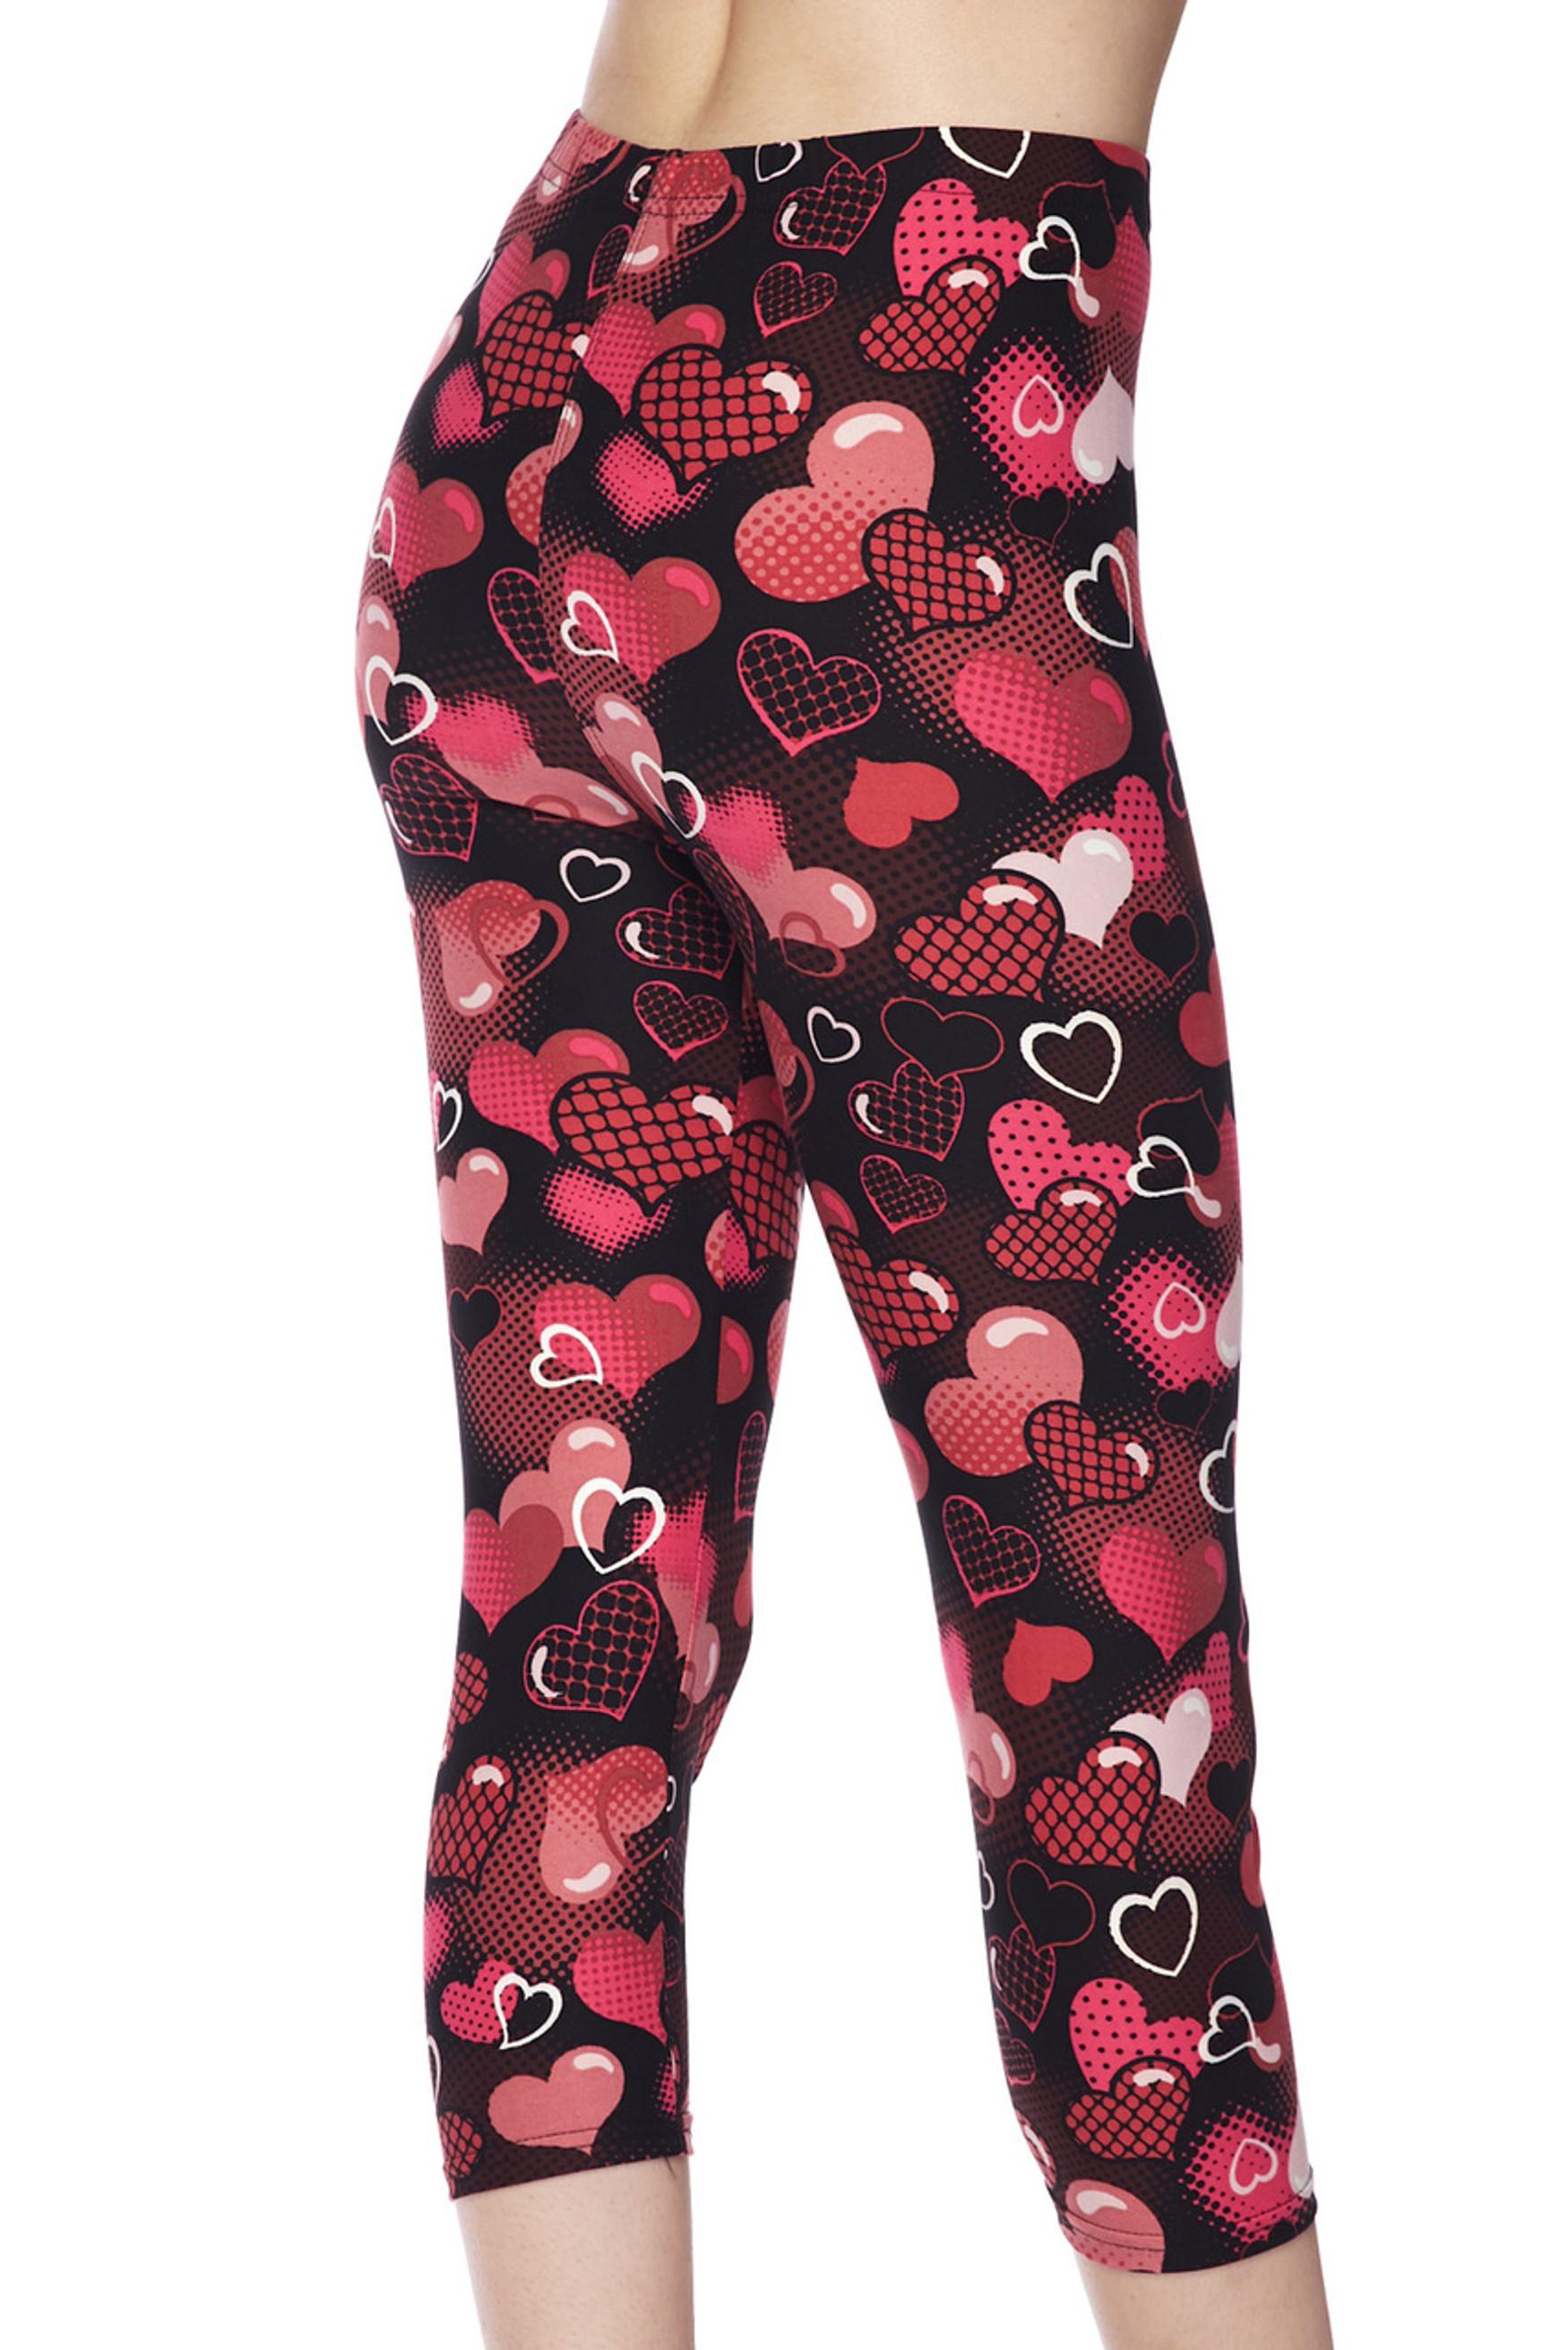 Brushed Motley Valentine Hearts Capris